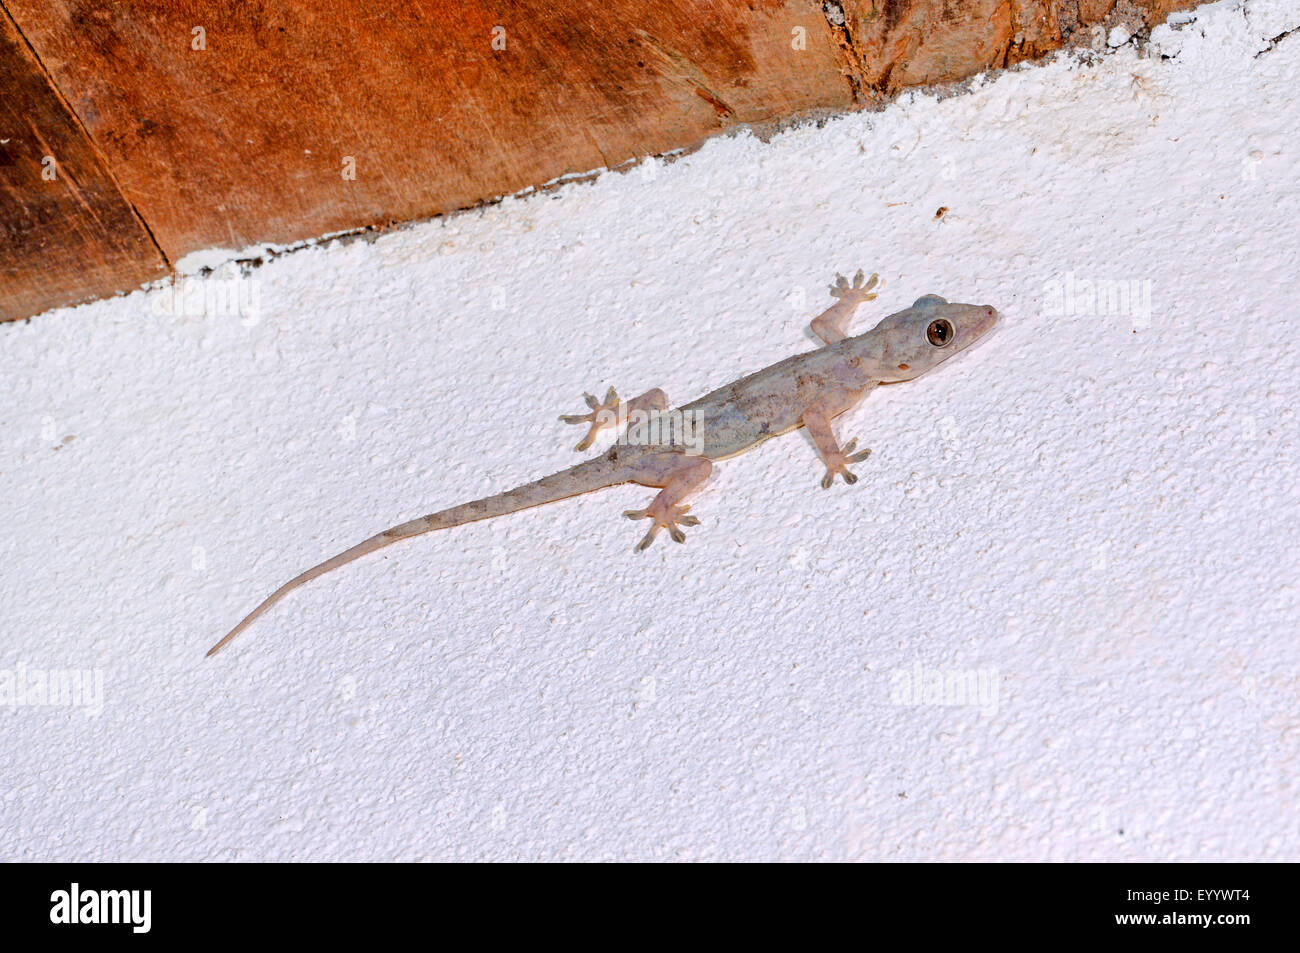 house gecko stock photos & house gecko stock images - alamy